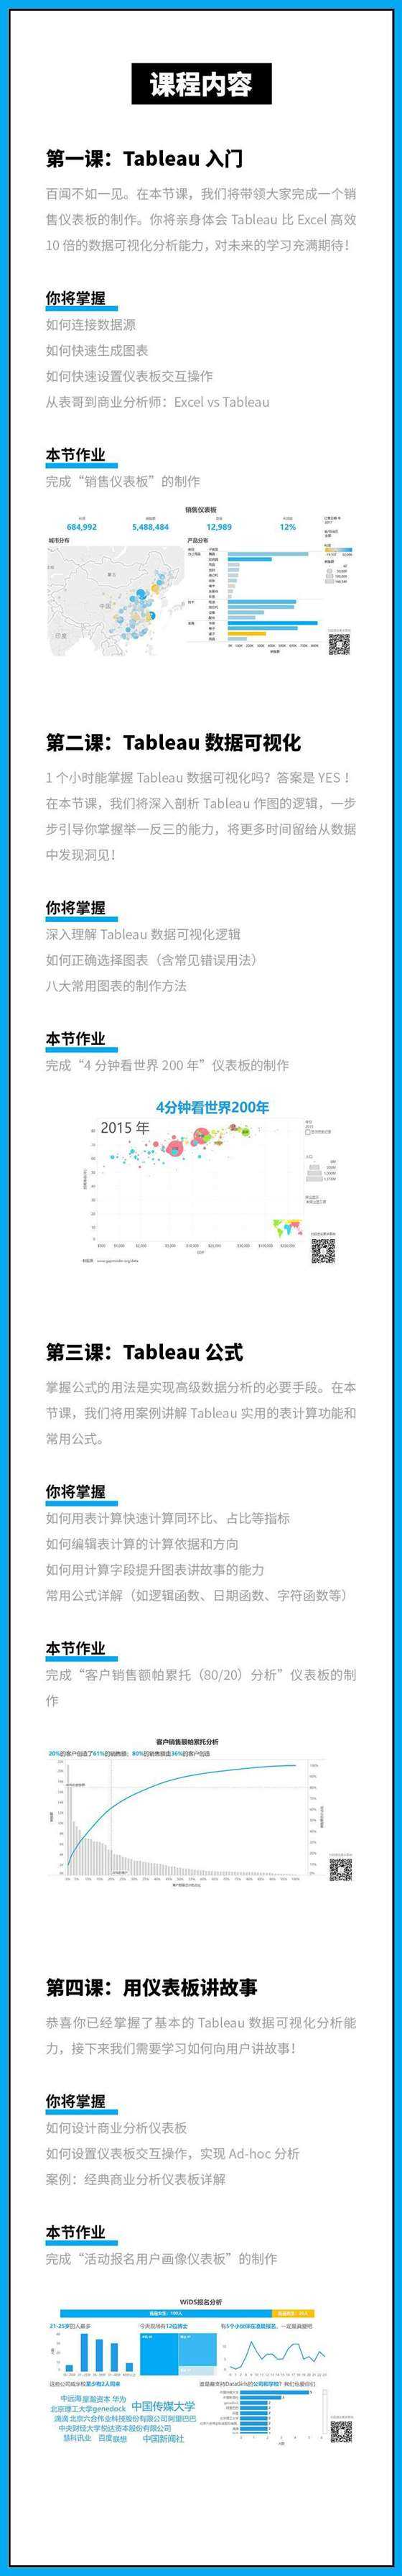 http://www.huodongxing.com/file/20170905/1692804578949/783233786559400.jpg